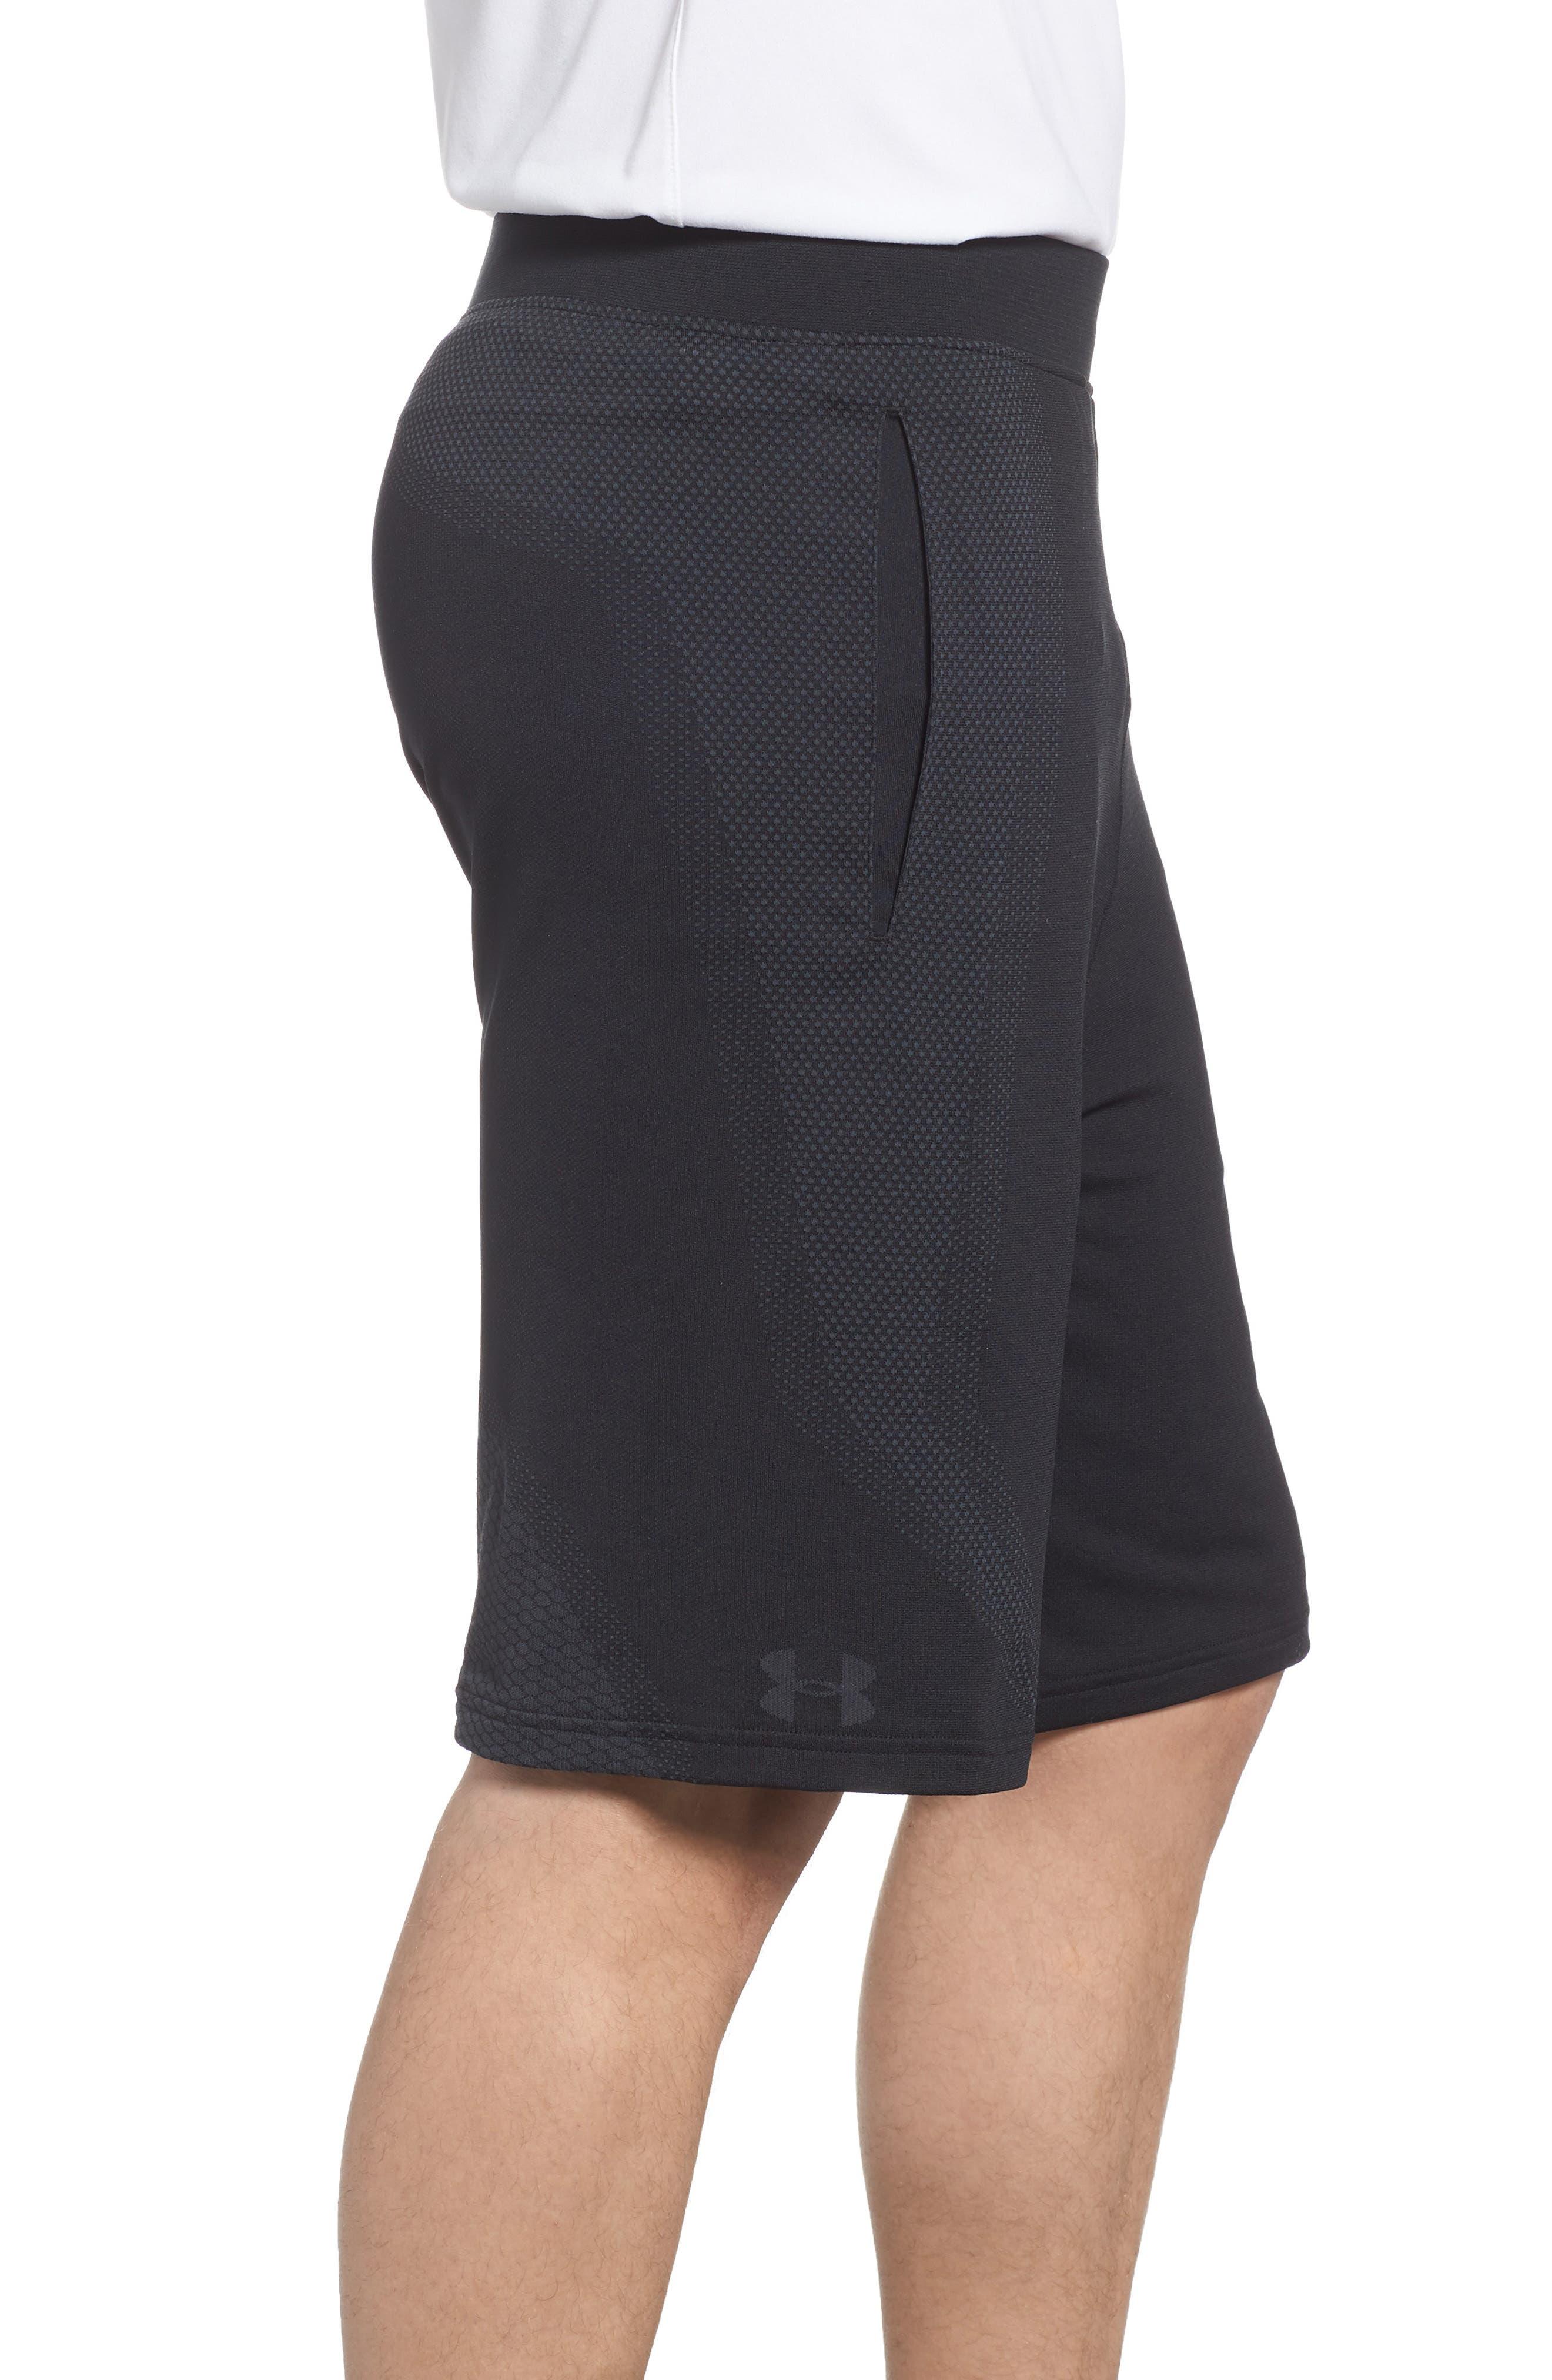 Threadborne Seamless Shorts,                             Alternate thumbnail 3, color,                             BLACK/ STEALTH GREH